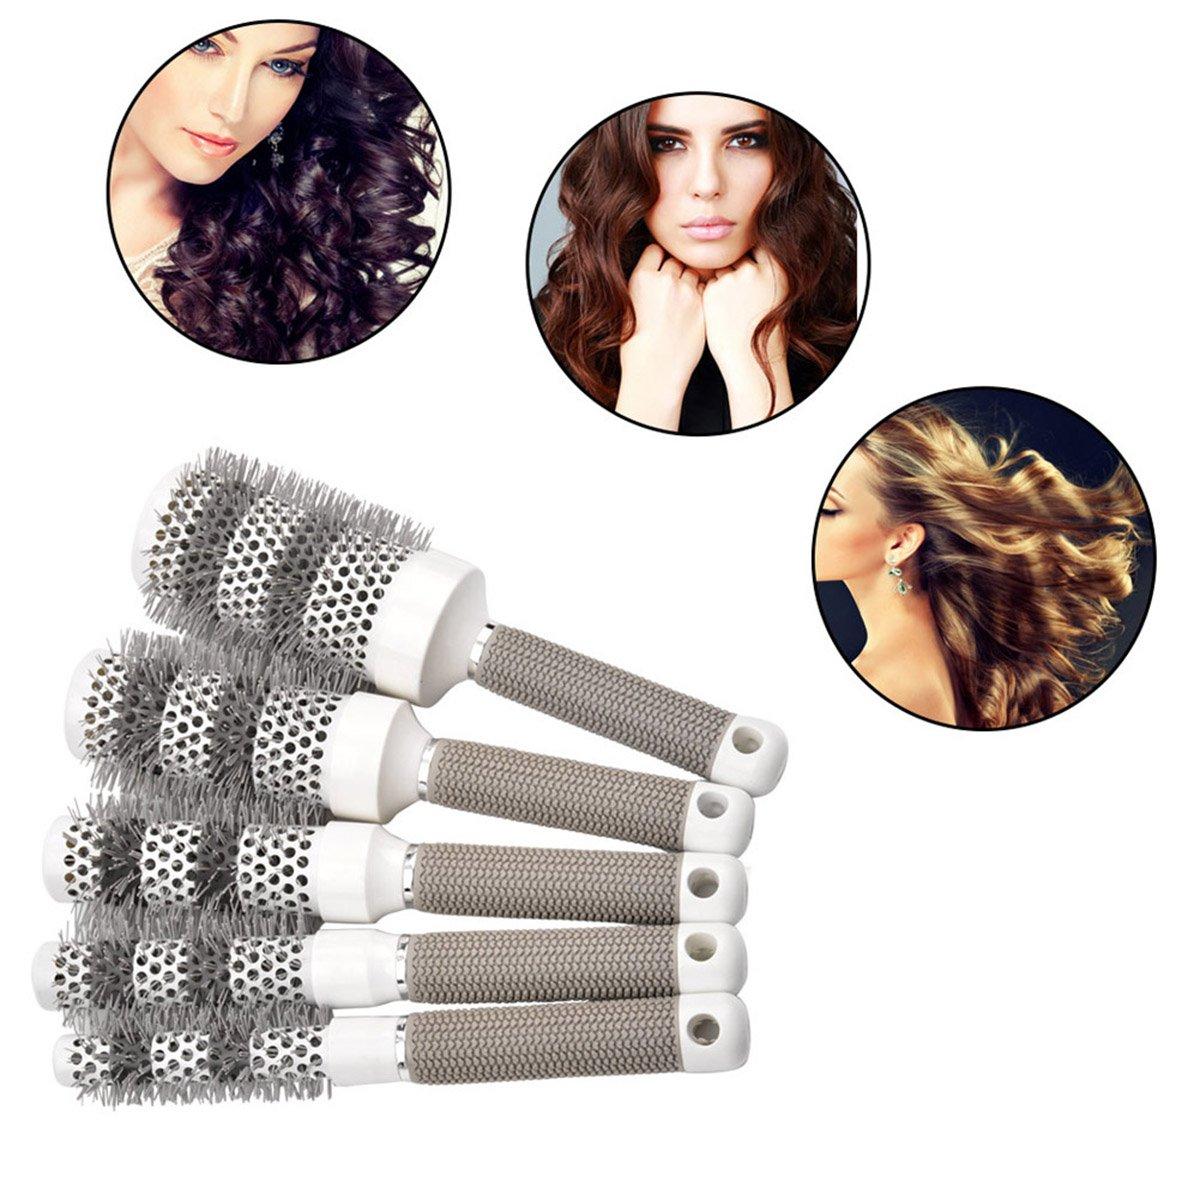 CkeyiN 5 Größen Hair Styling Keramik Rundbürste Haare kämmen Friseursalon Pinsel